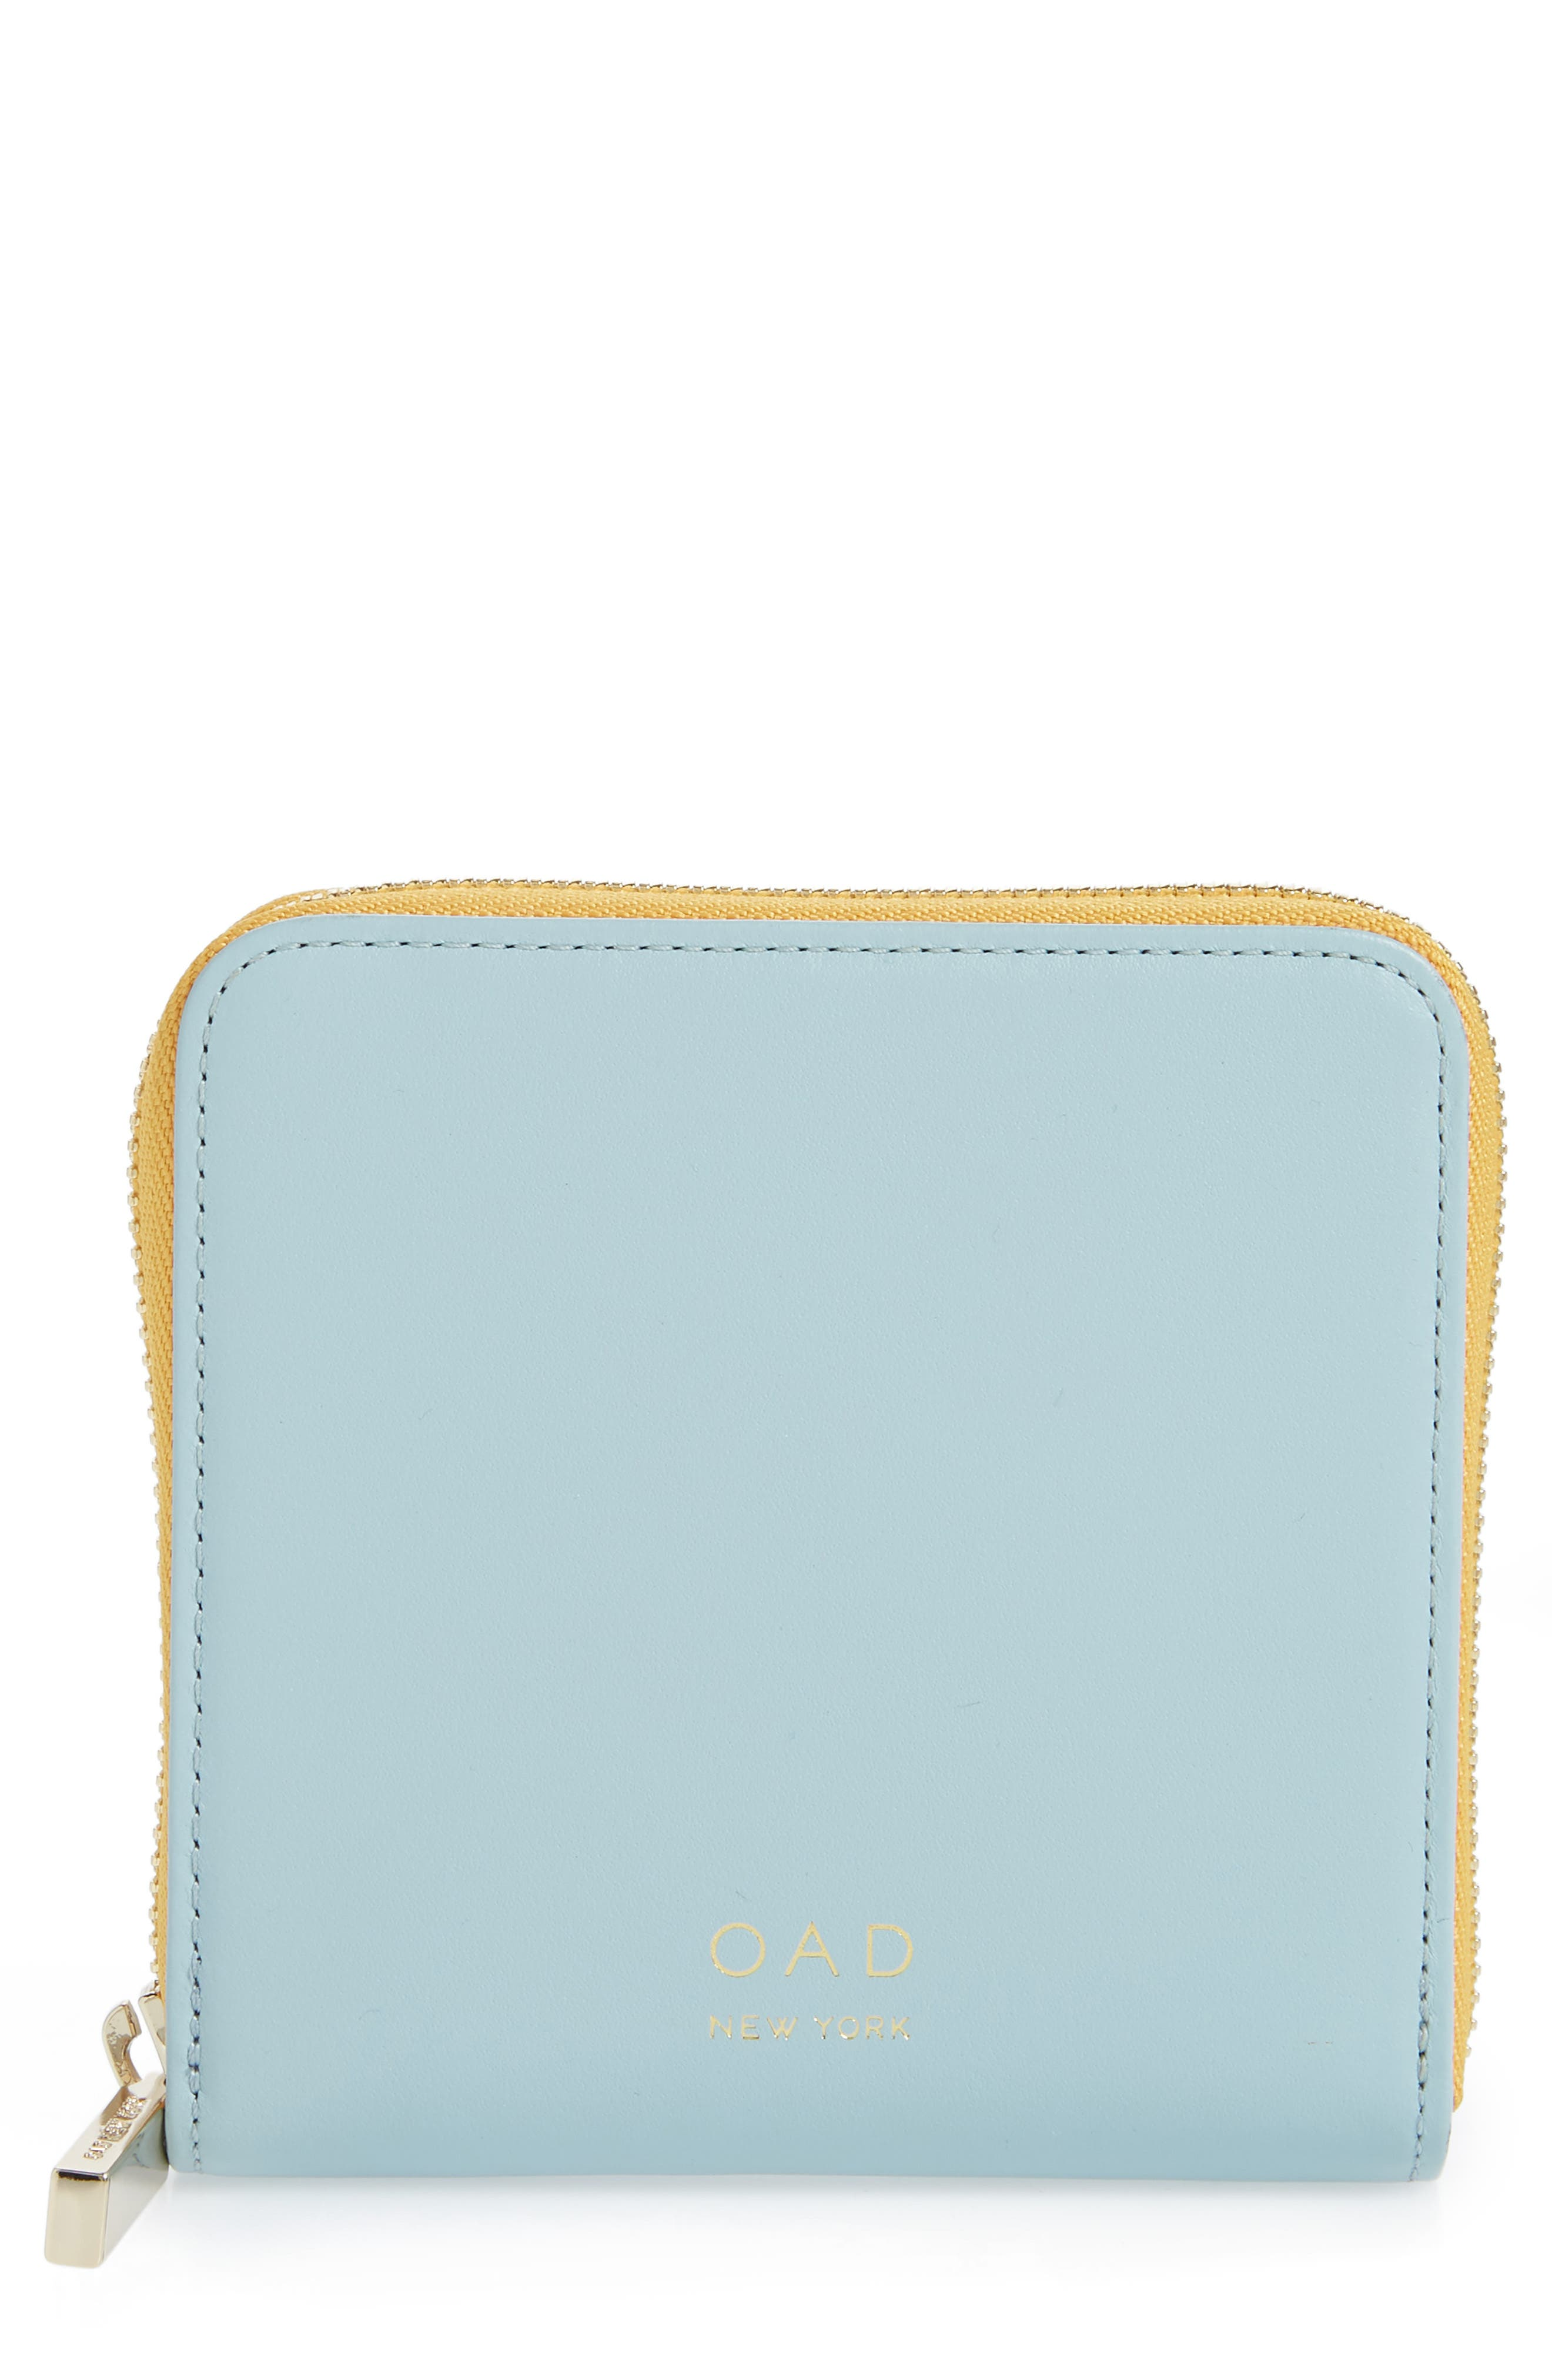 Half Zip Carryall Wallet,                             Main thumbnail 1, color,                             CLOUD BLUE/ HONEY